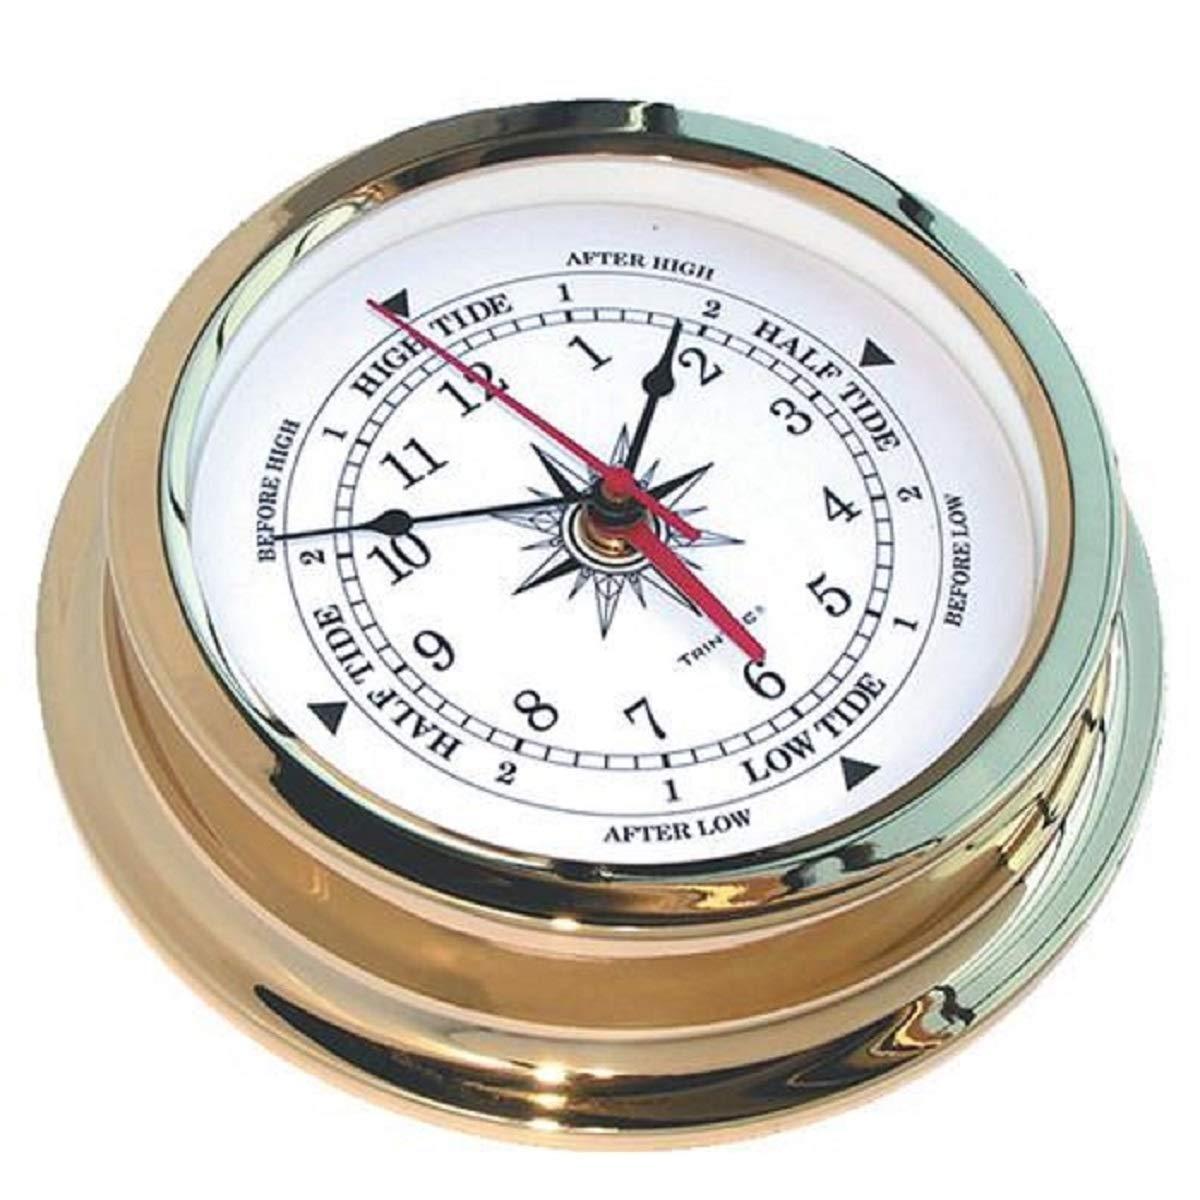 Trintec Solaris Brass Time & Tide Clock